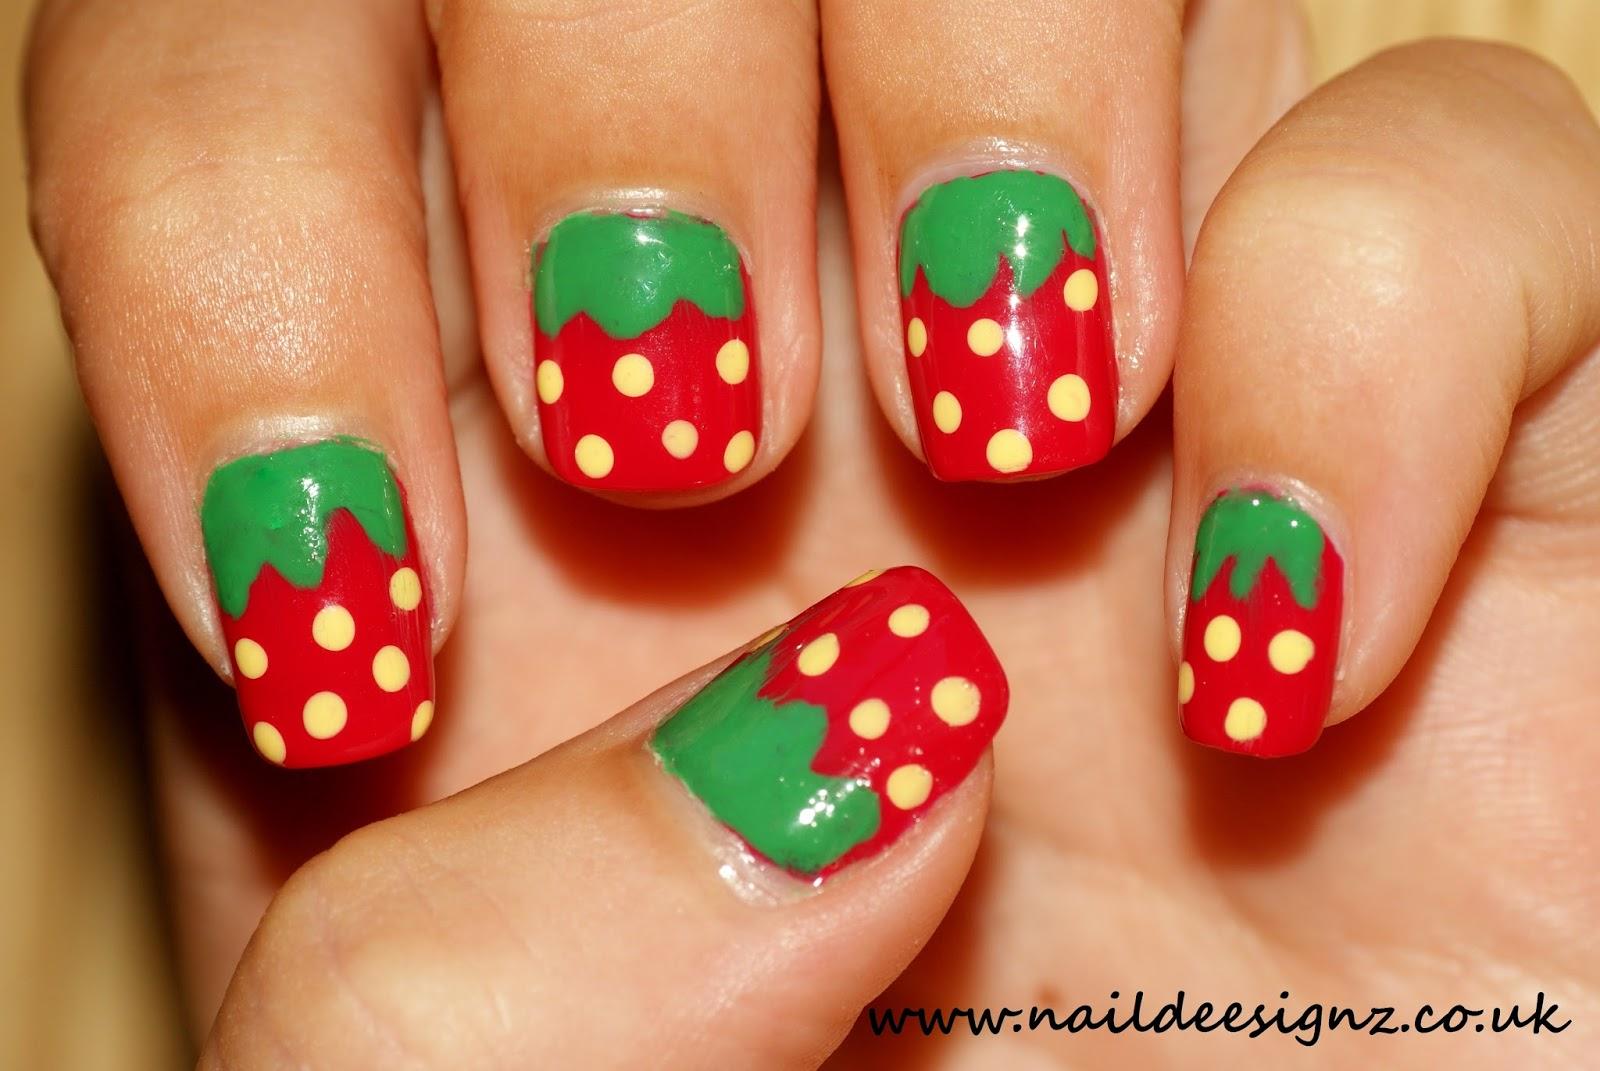 Christines Nail Designs Easy Nail Designs For Short Nails